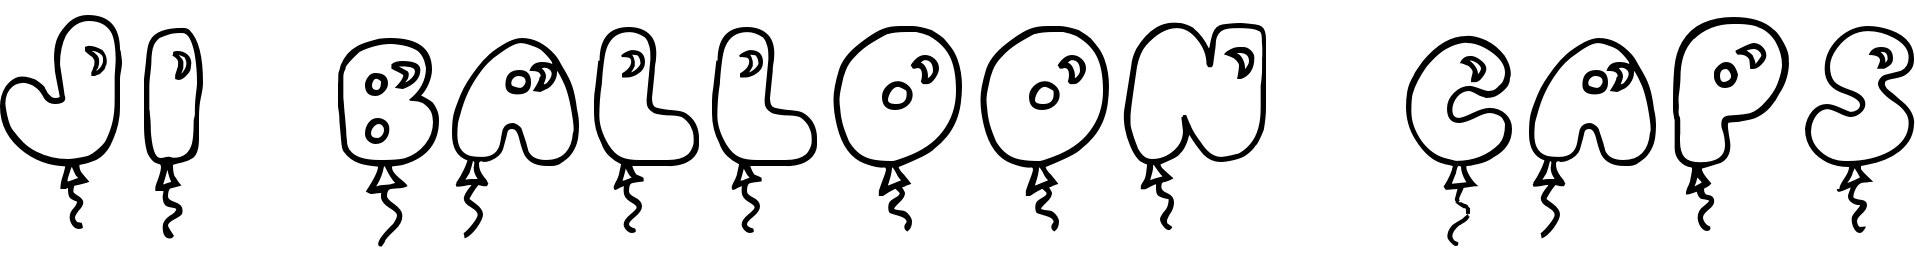 JI Balloon Caps